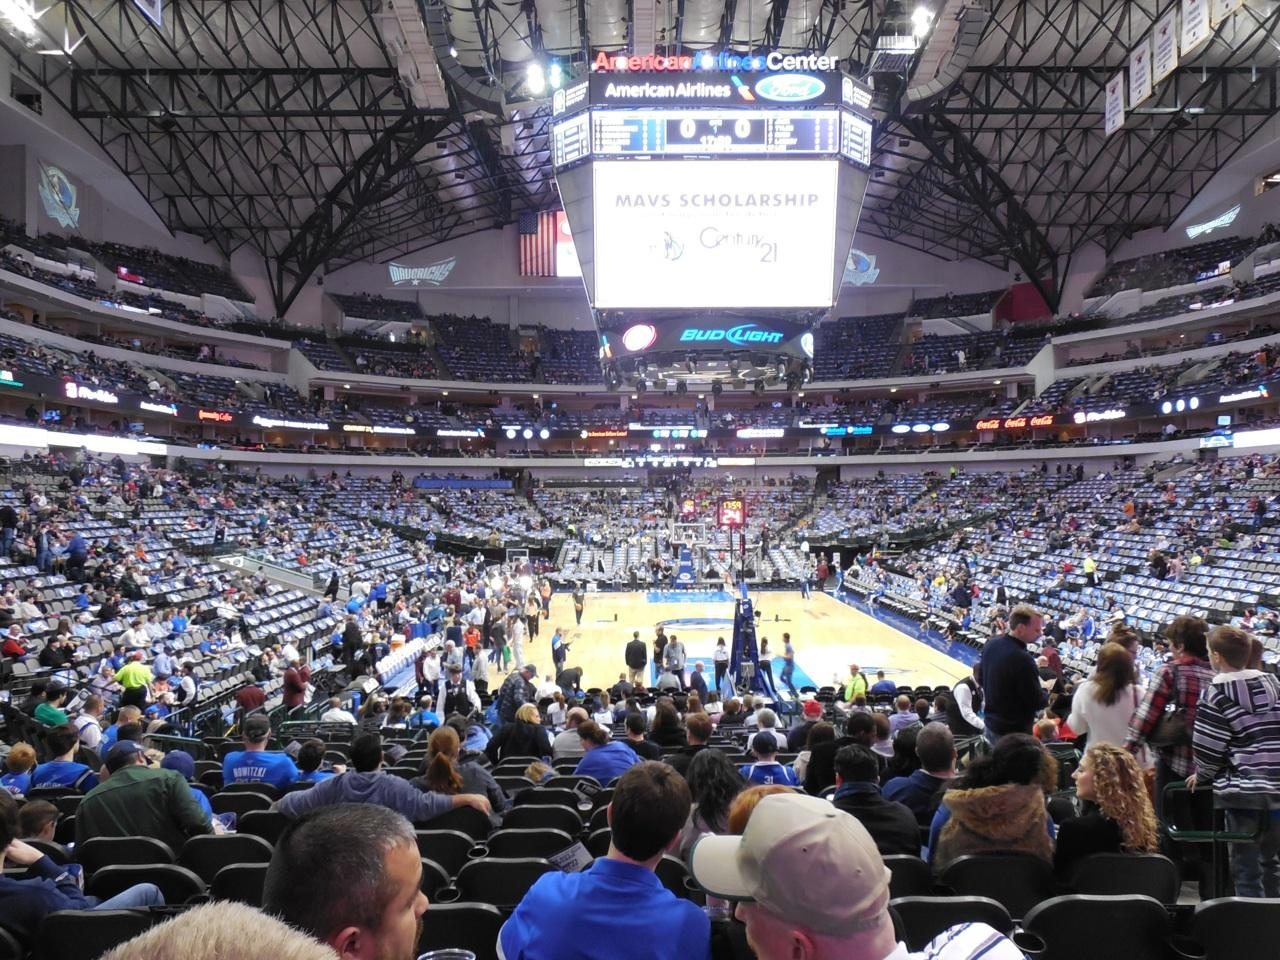 Dallas Mavericks American Airlines Center Section 113